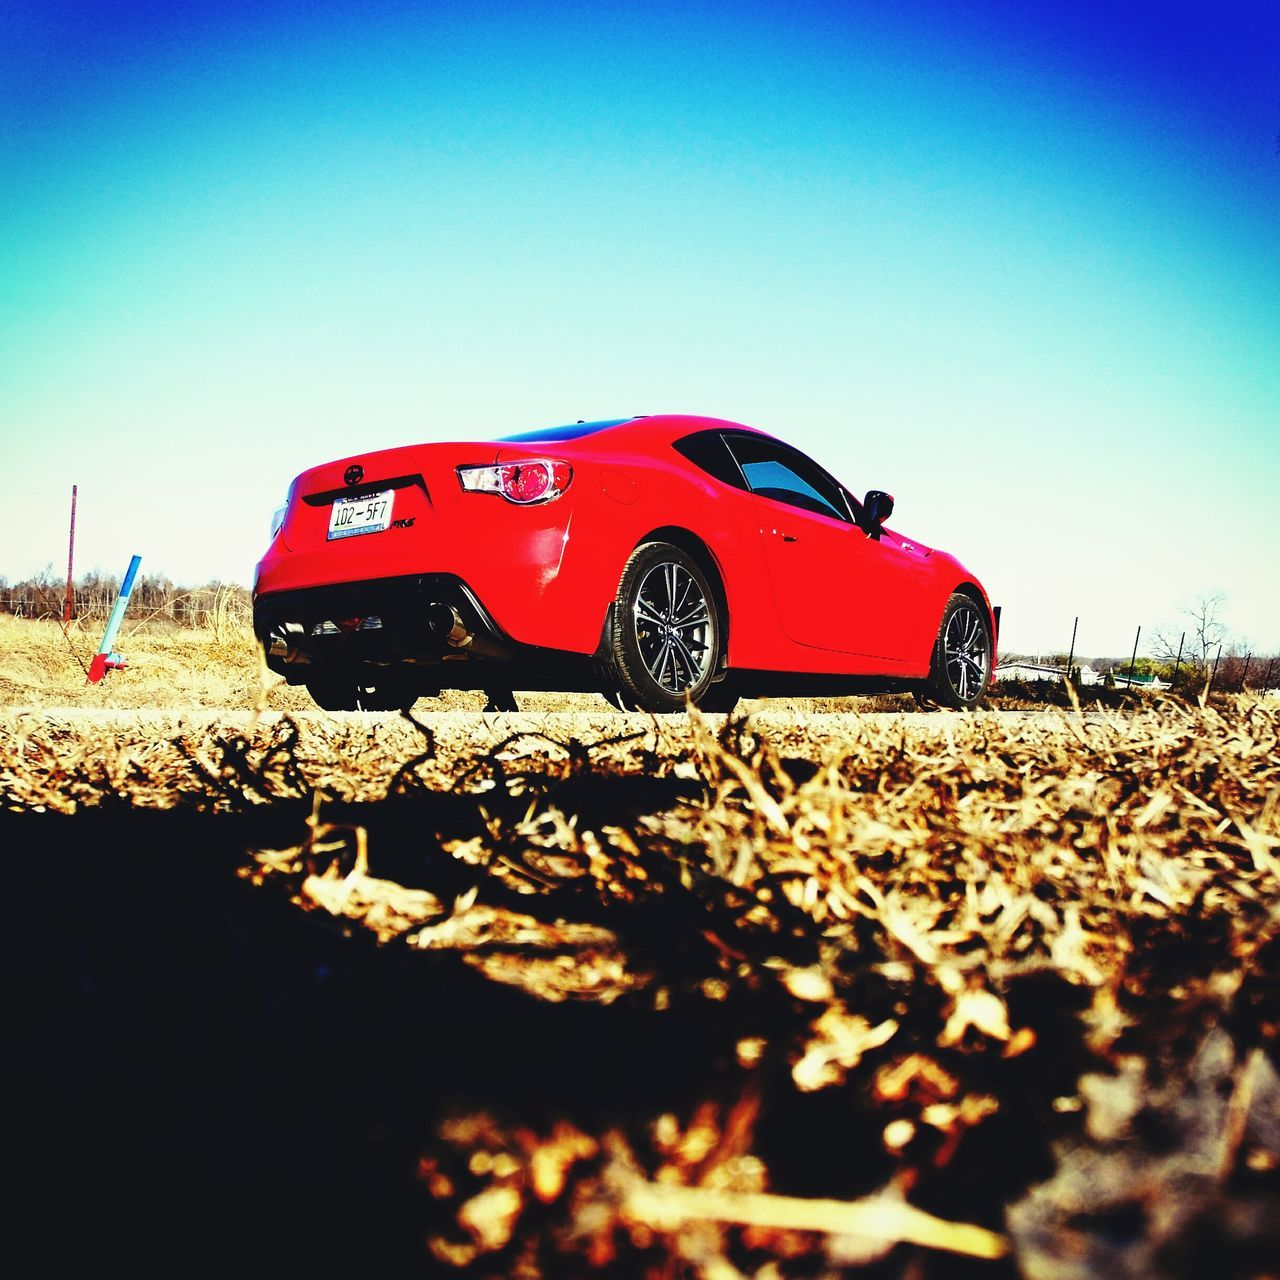 Car Red Sunlight No People Motorsport Outdoors Day Sky Transportation FRS Scion  Scion Fr-S Vehicle Breakdown